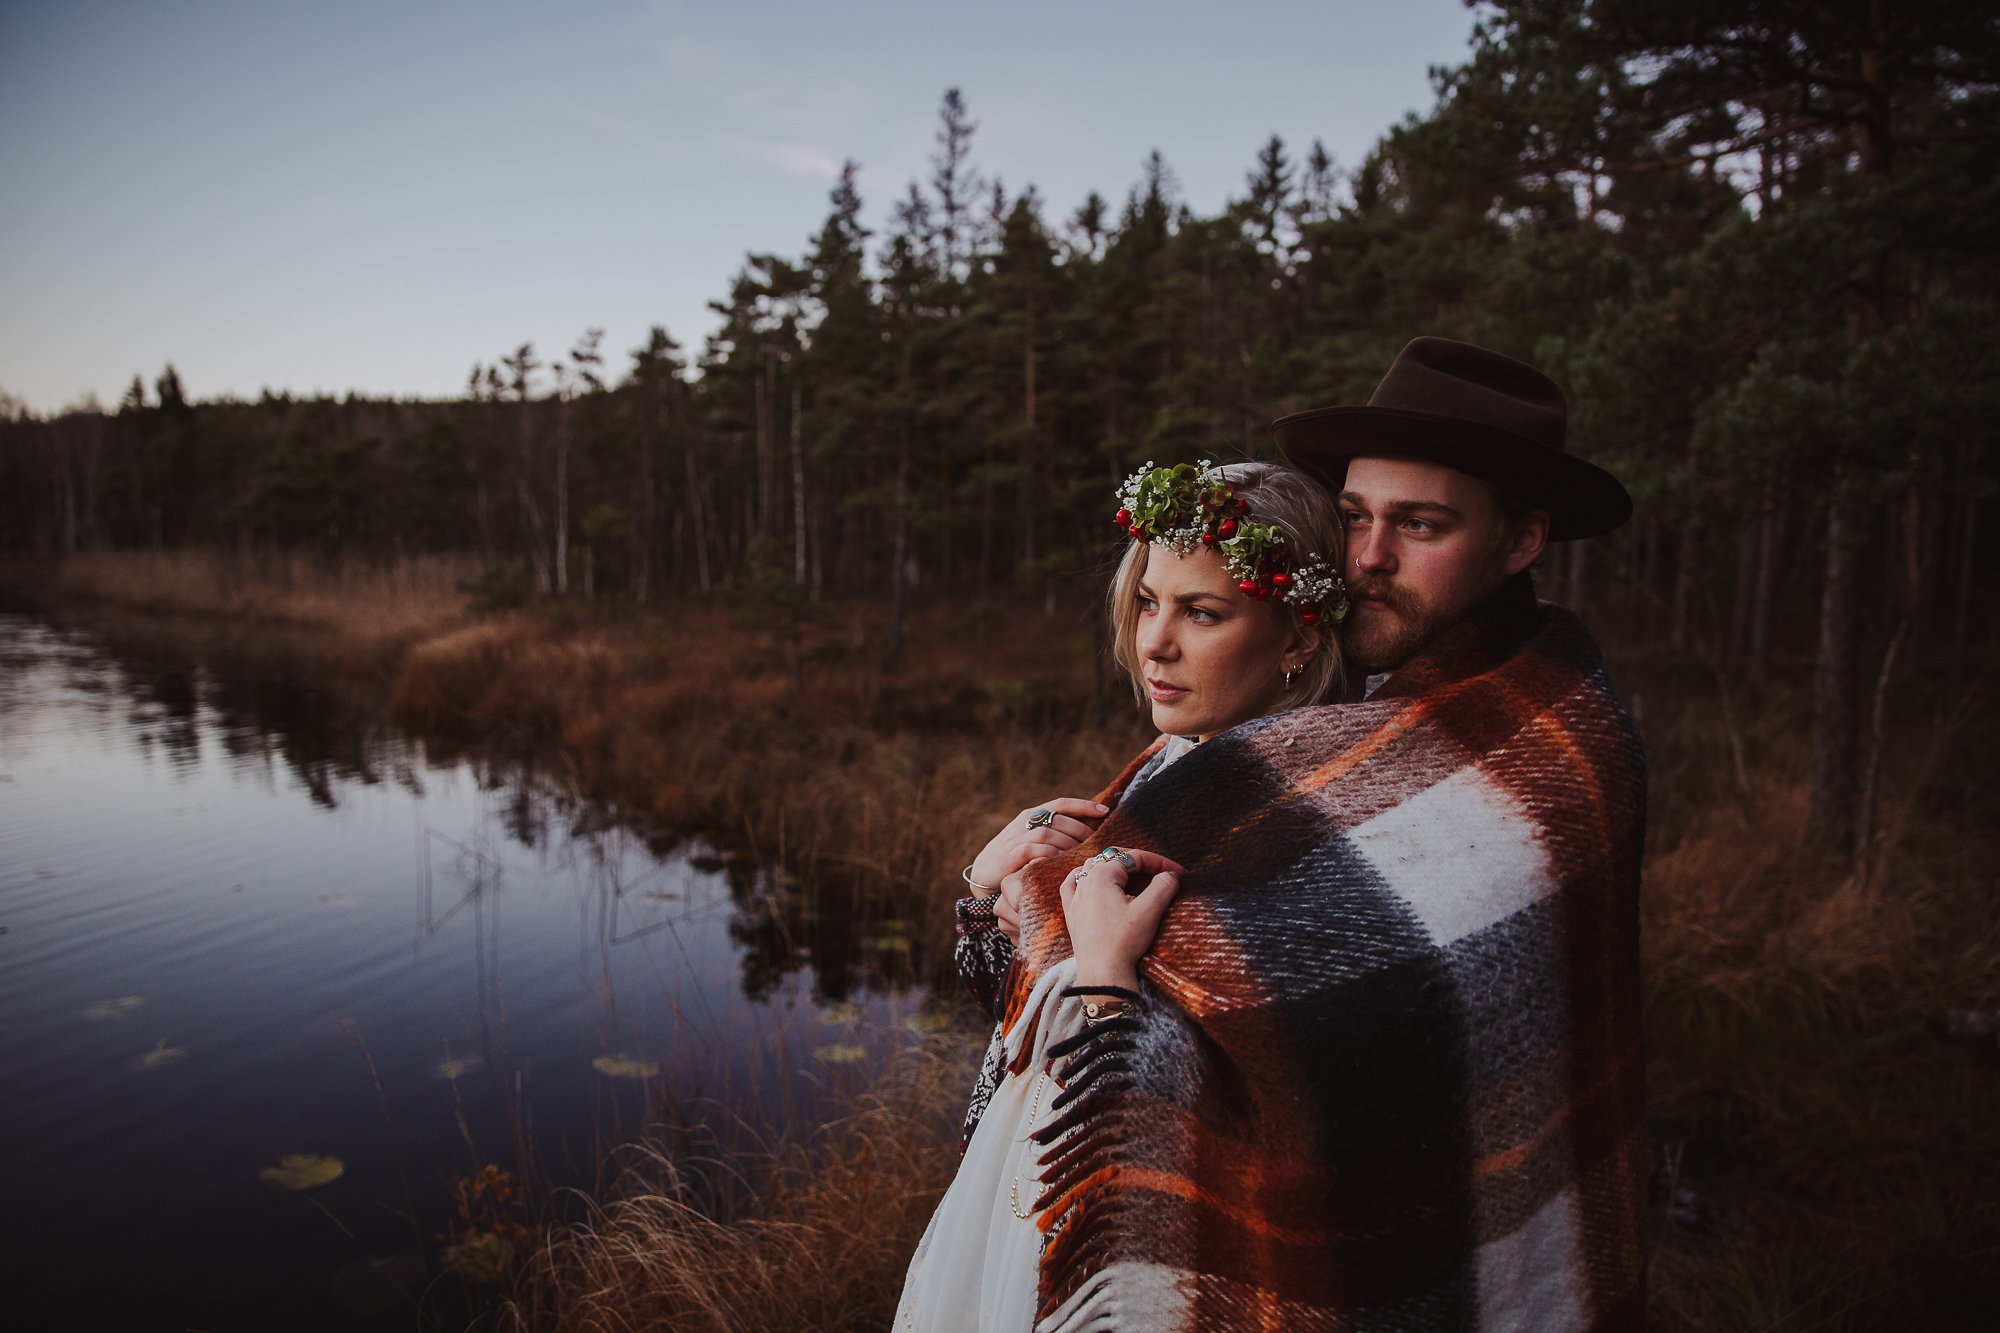 MajAxel_2017_Sweden_Weddingphotographer_NatalieGreppi_WEB-155.jpg